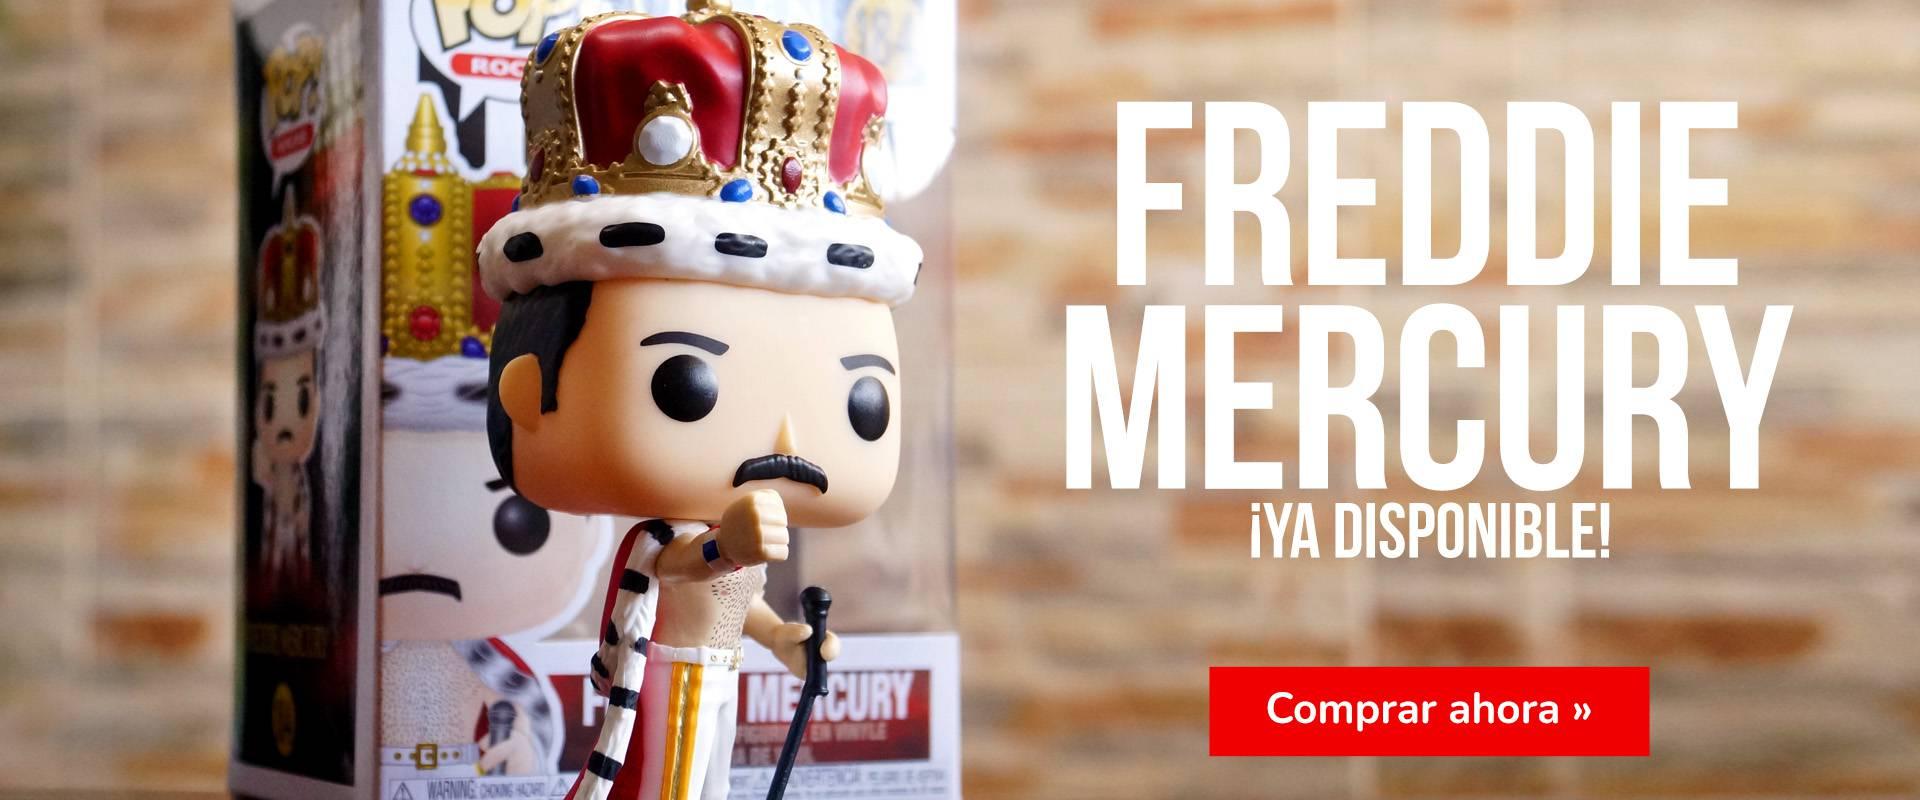 ¡Funko POP Freddie Mercury disponible!